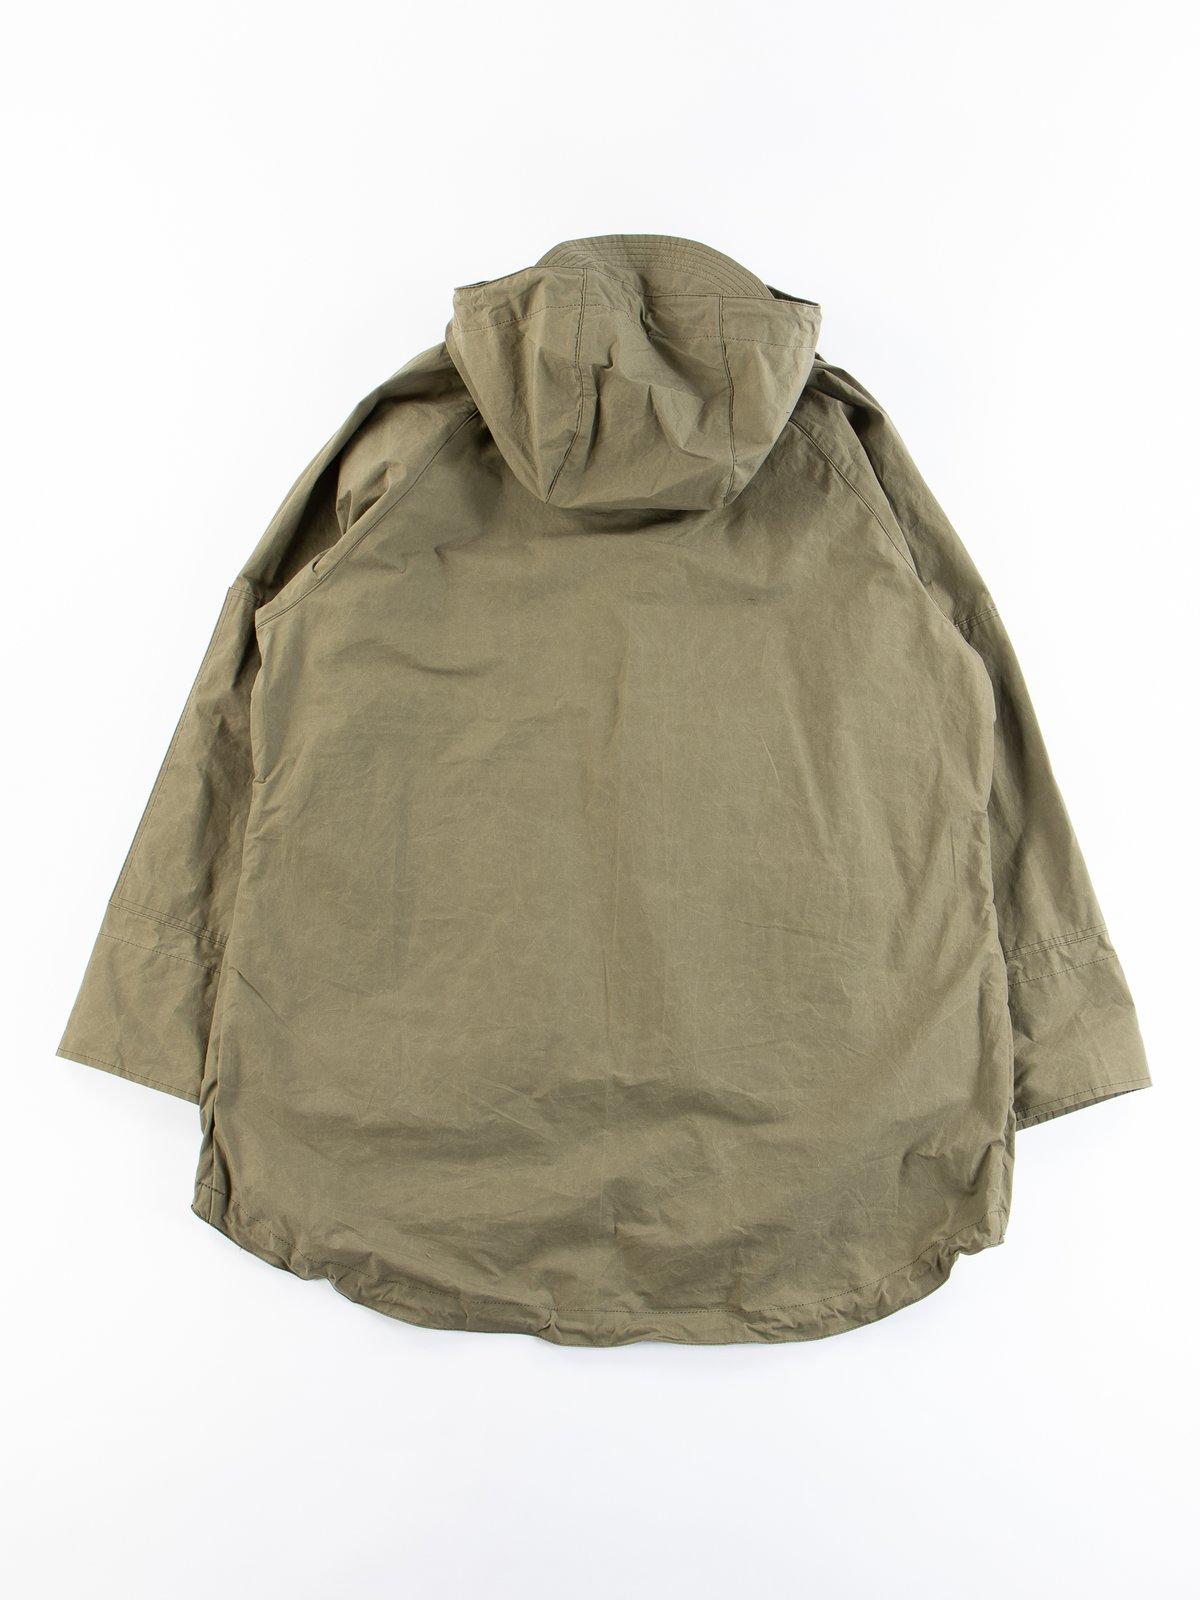 Olive Warby Jacket - Image 6